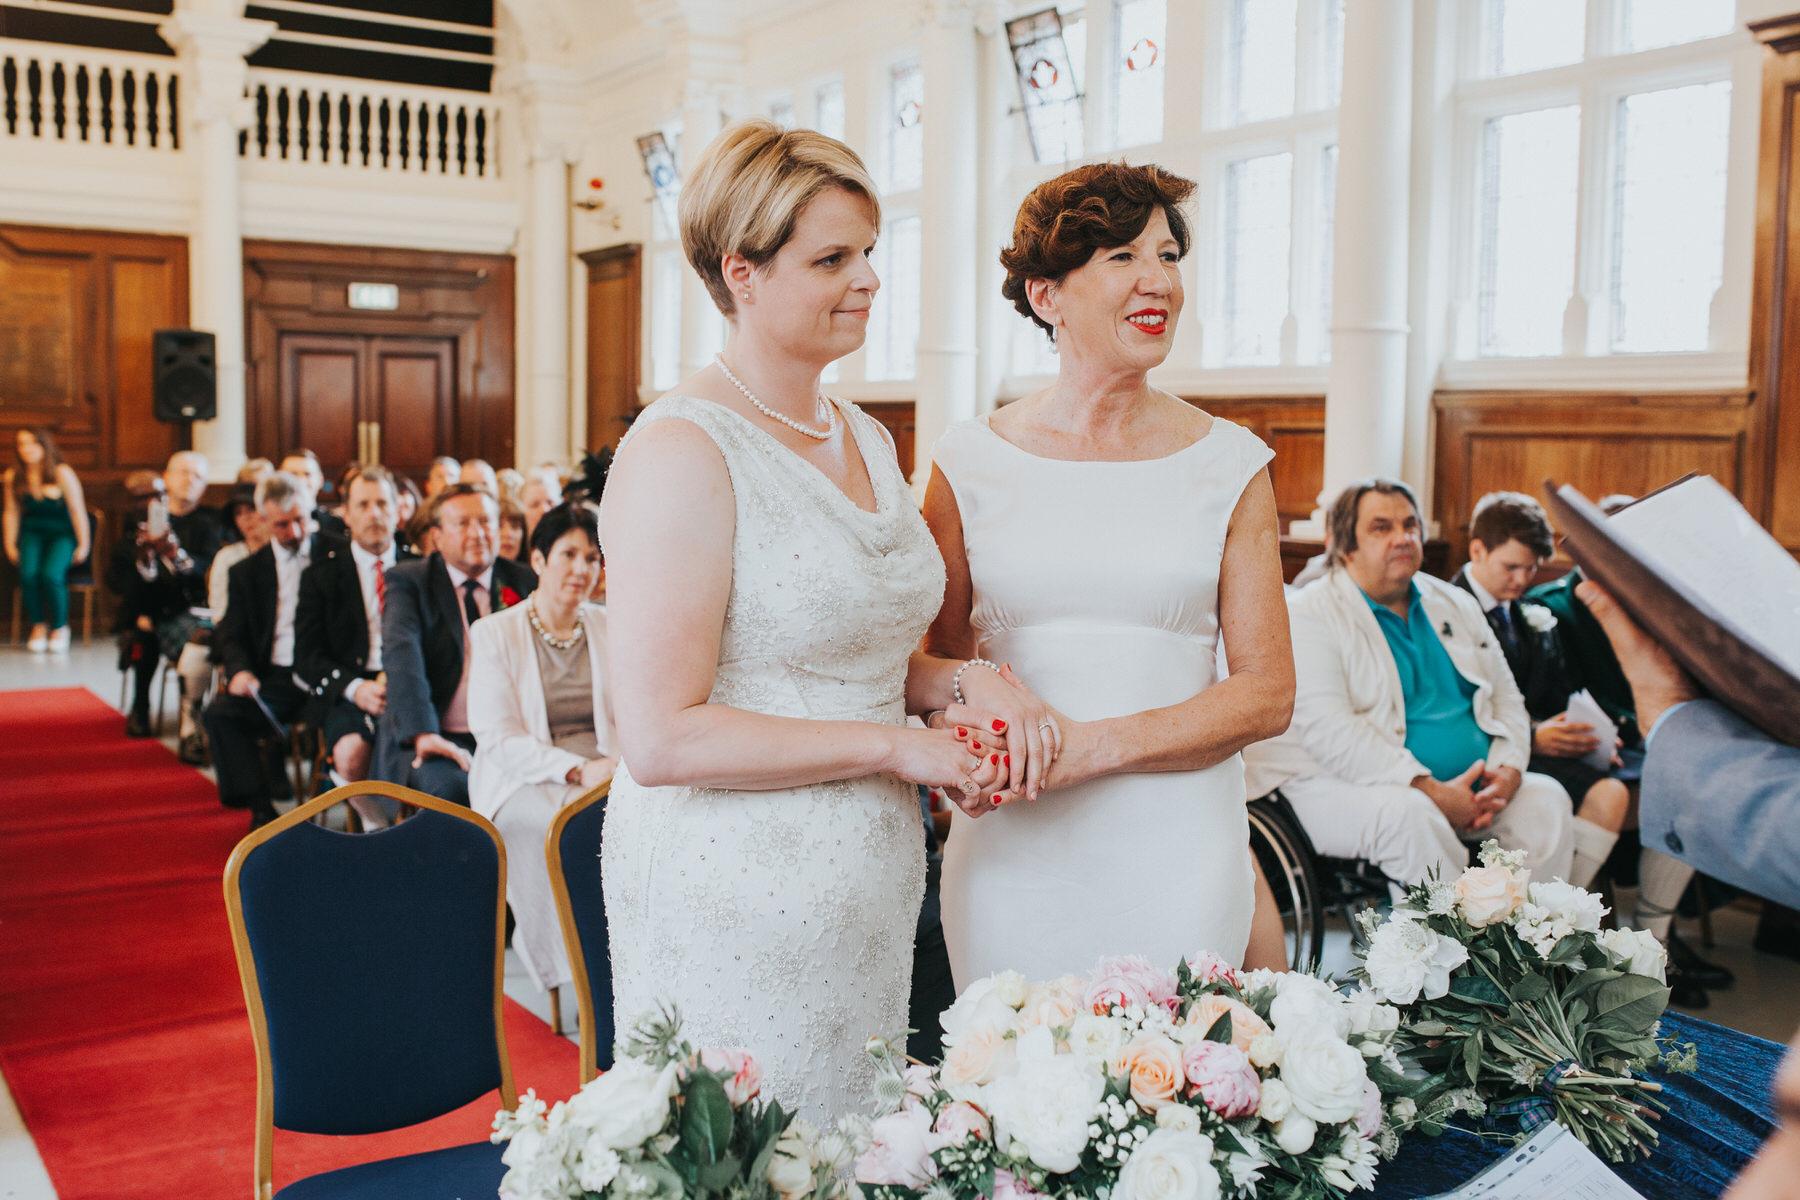 112 Finsbury Town Hall samesex wedding ceremony two brides.jpg